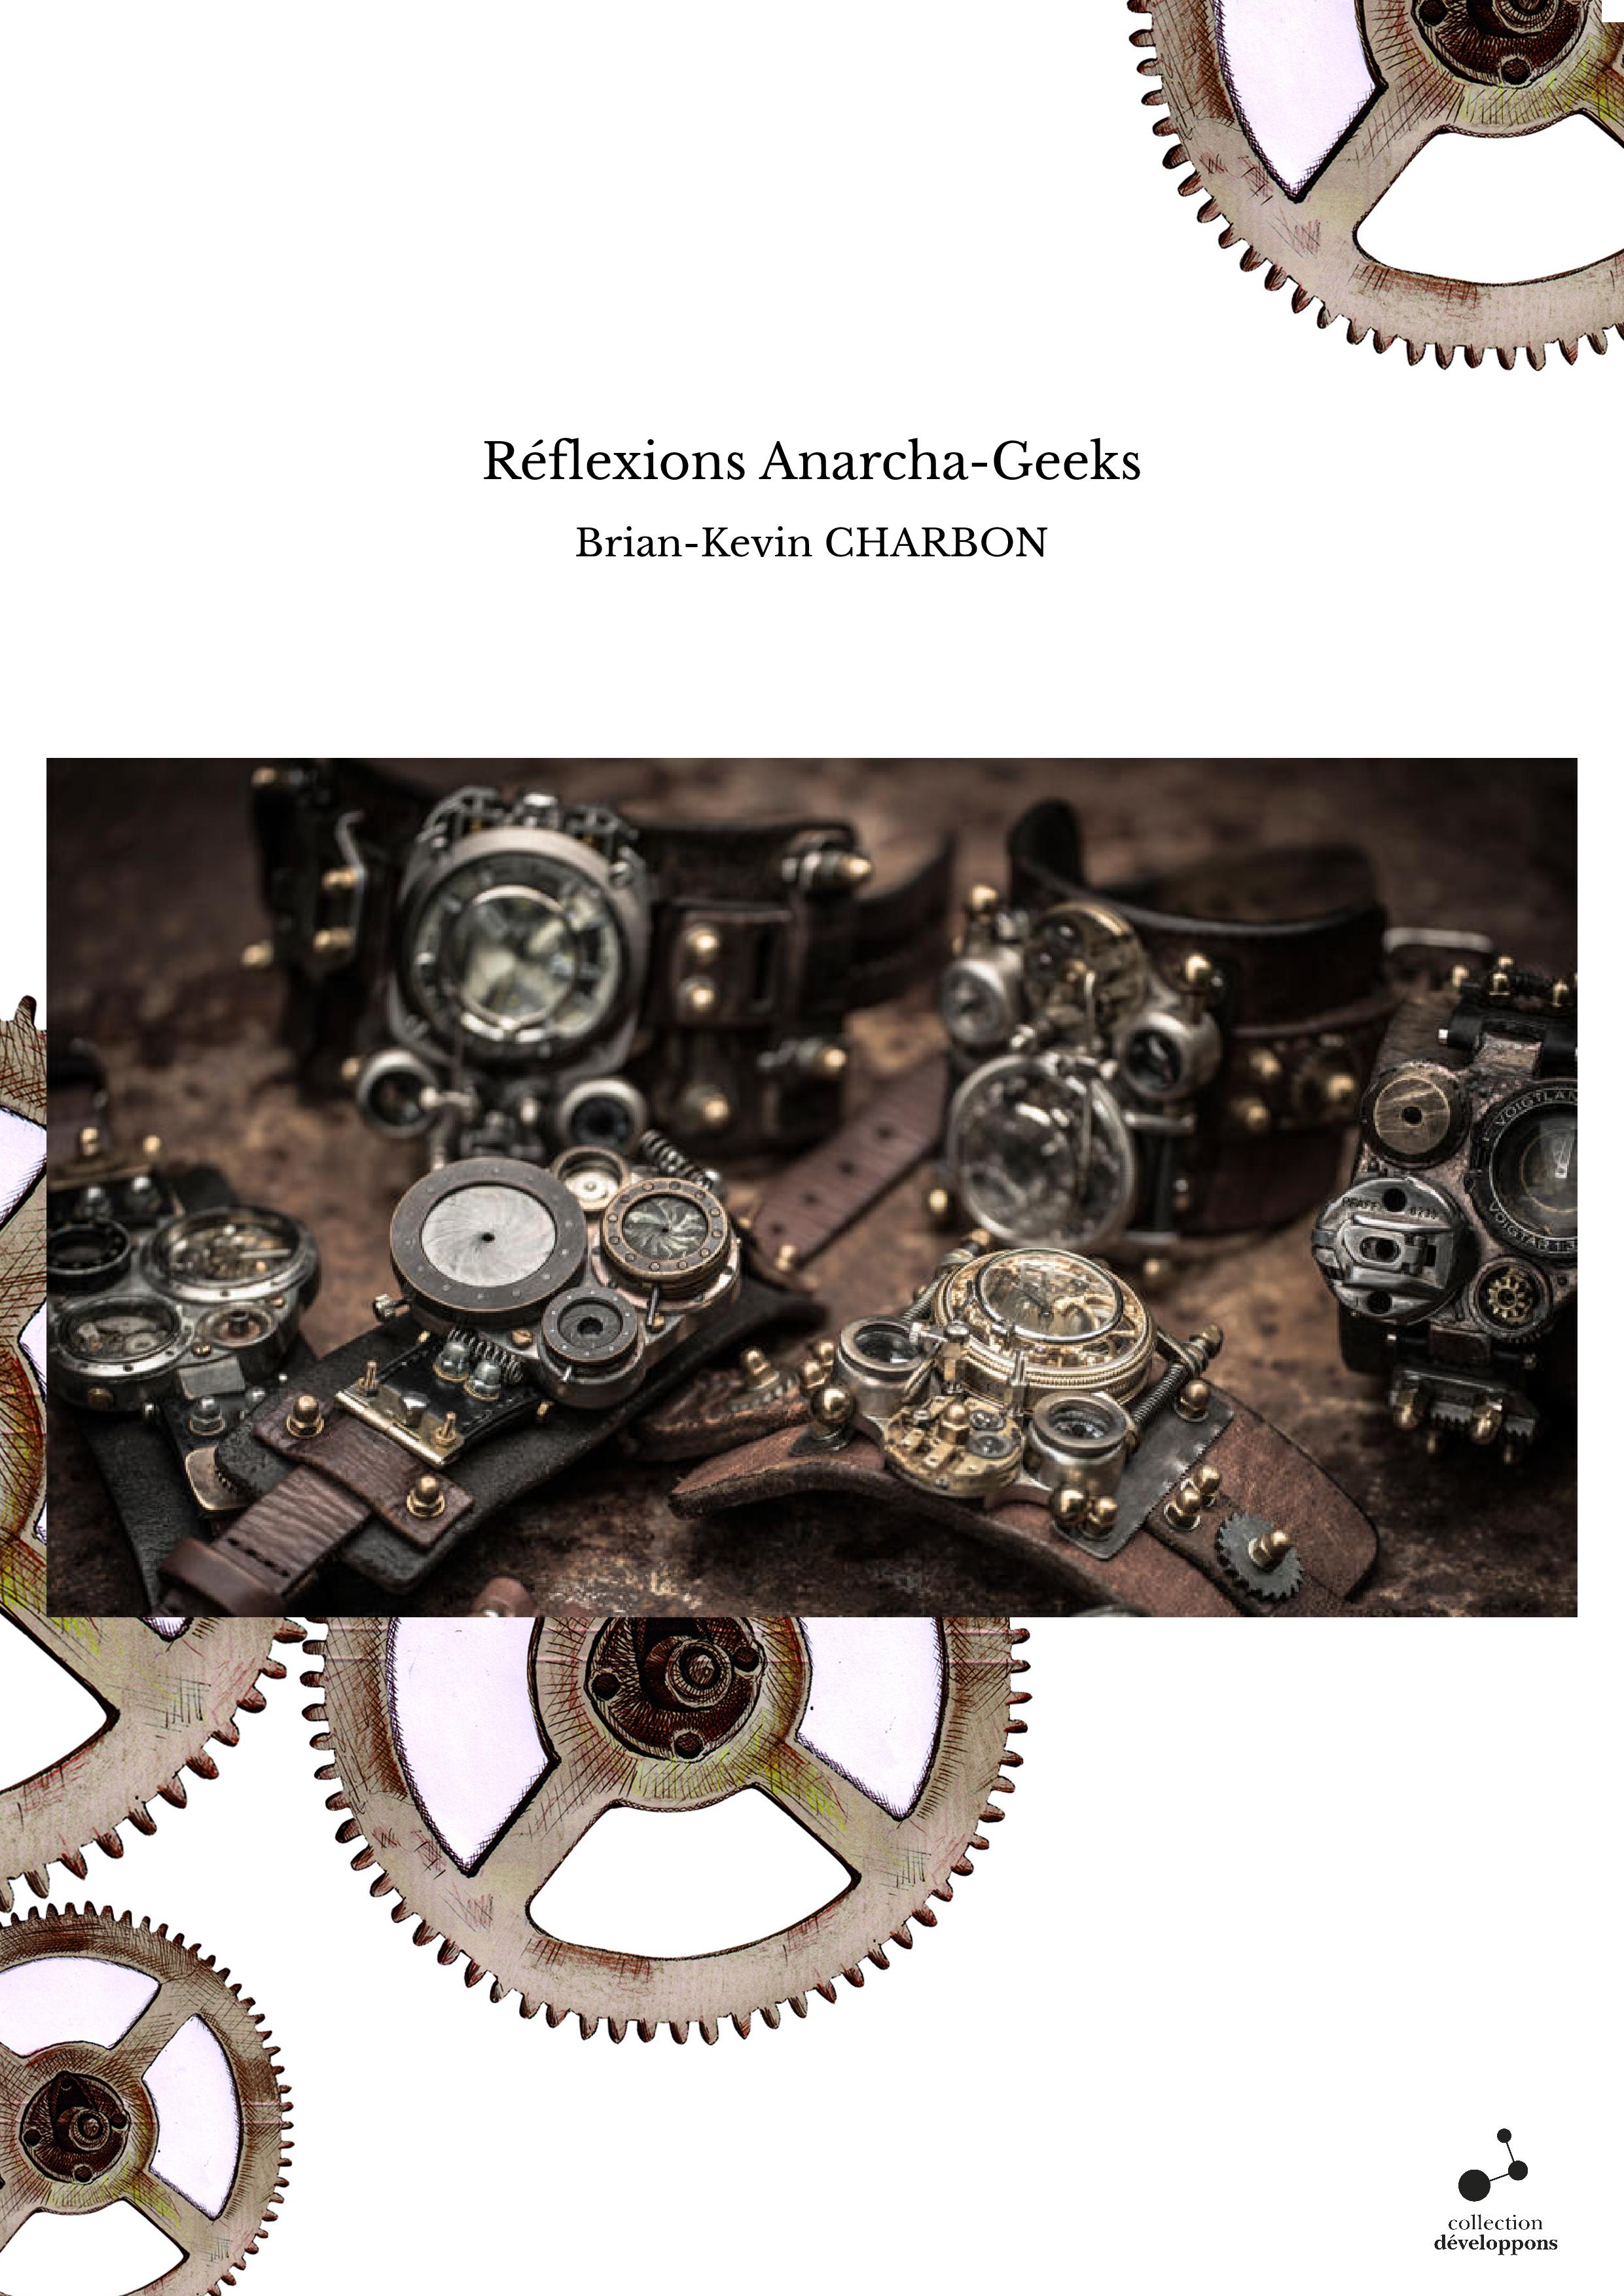 Réflexions Anarcha-Geeks